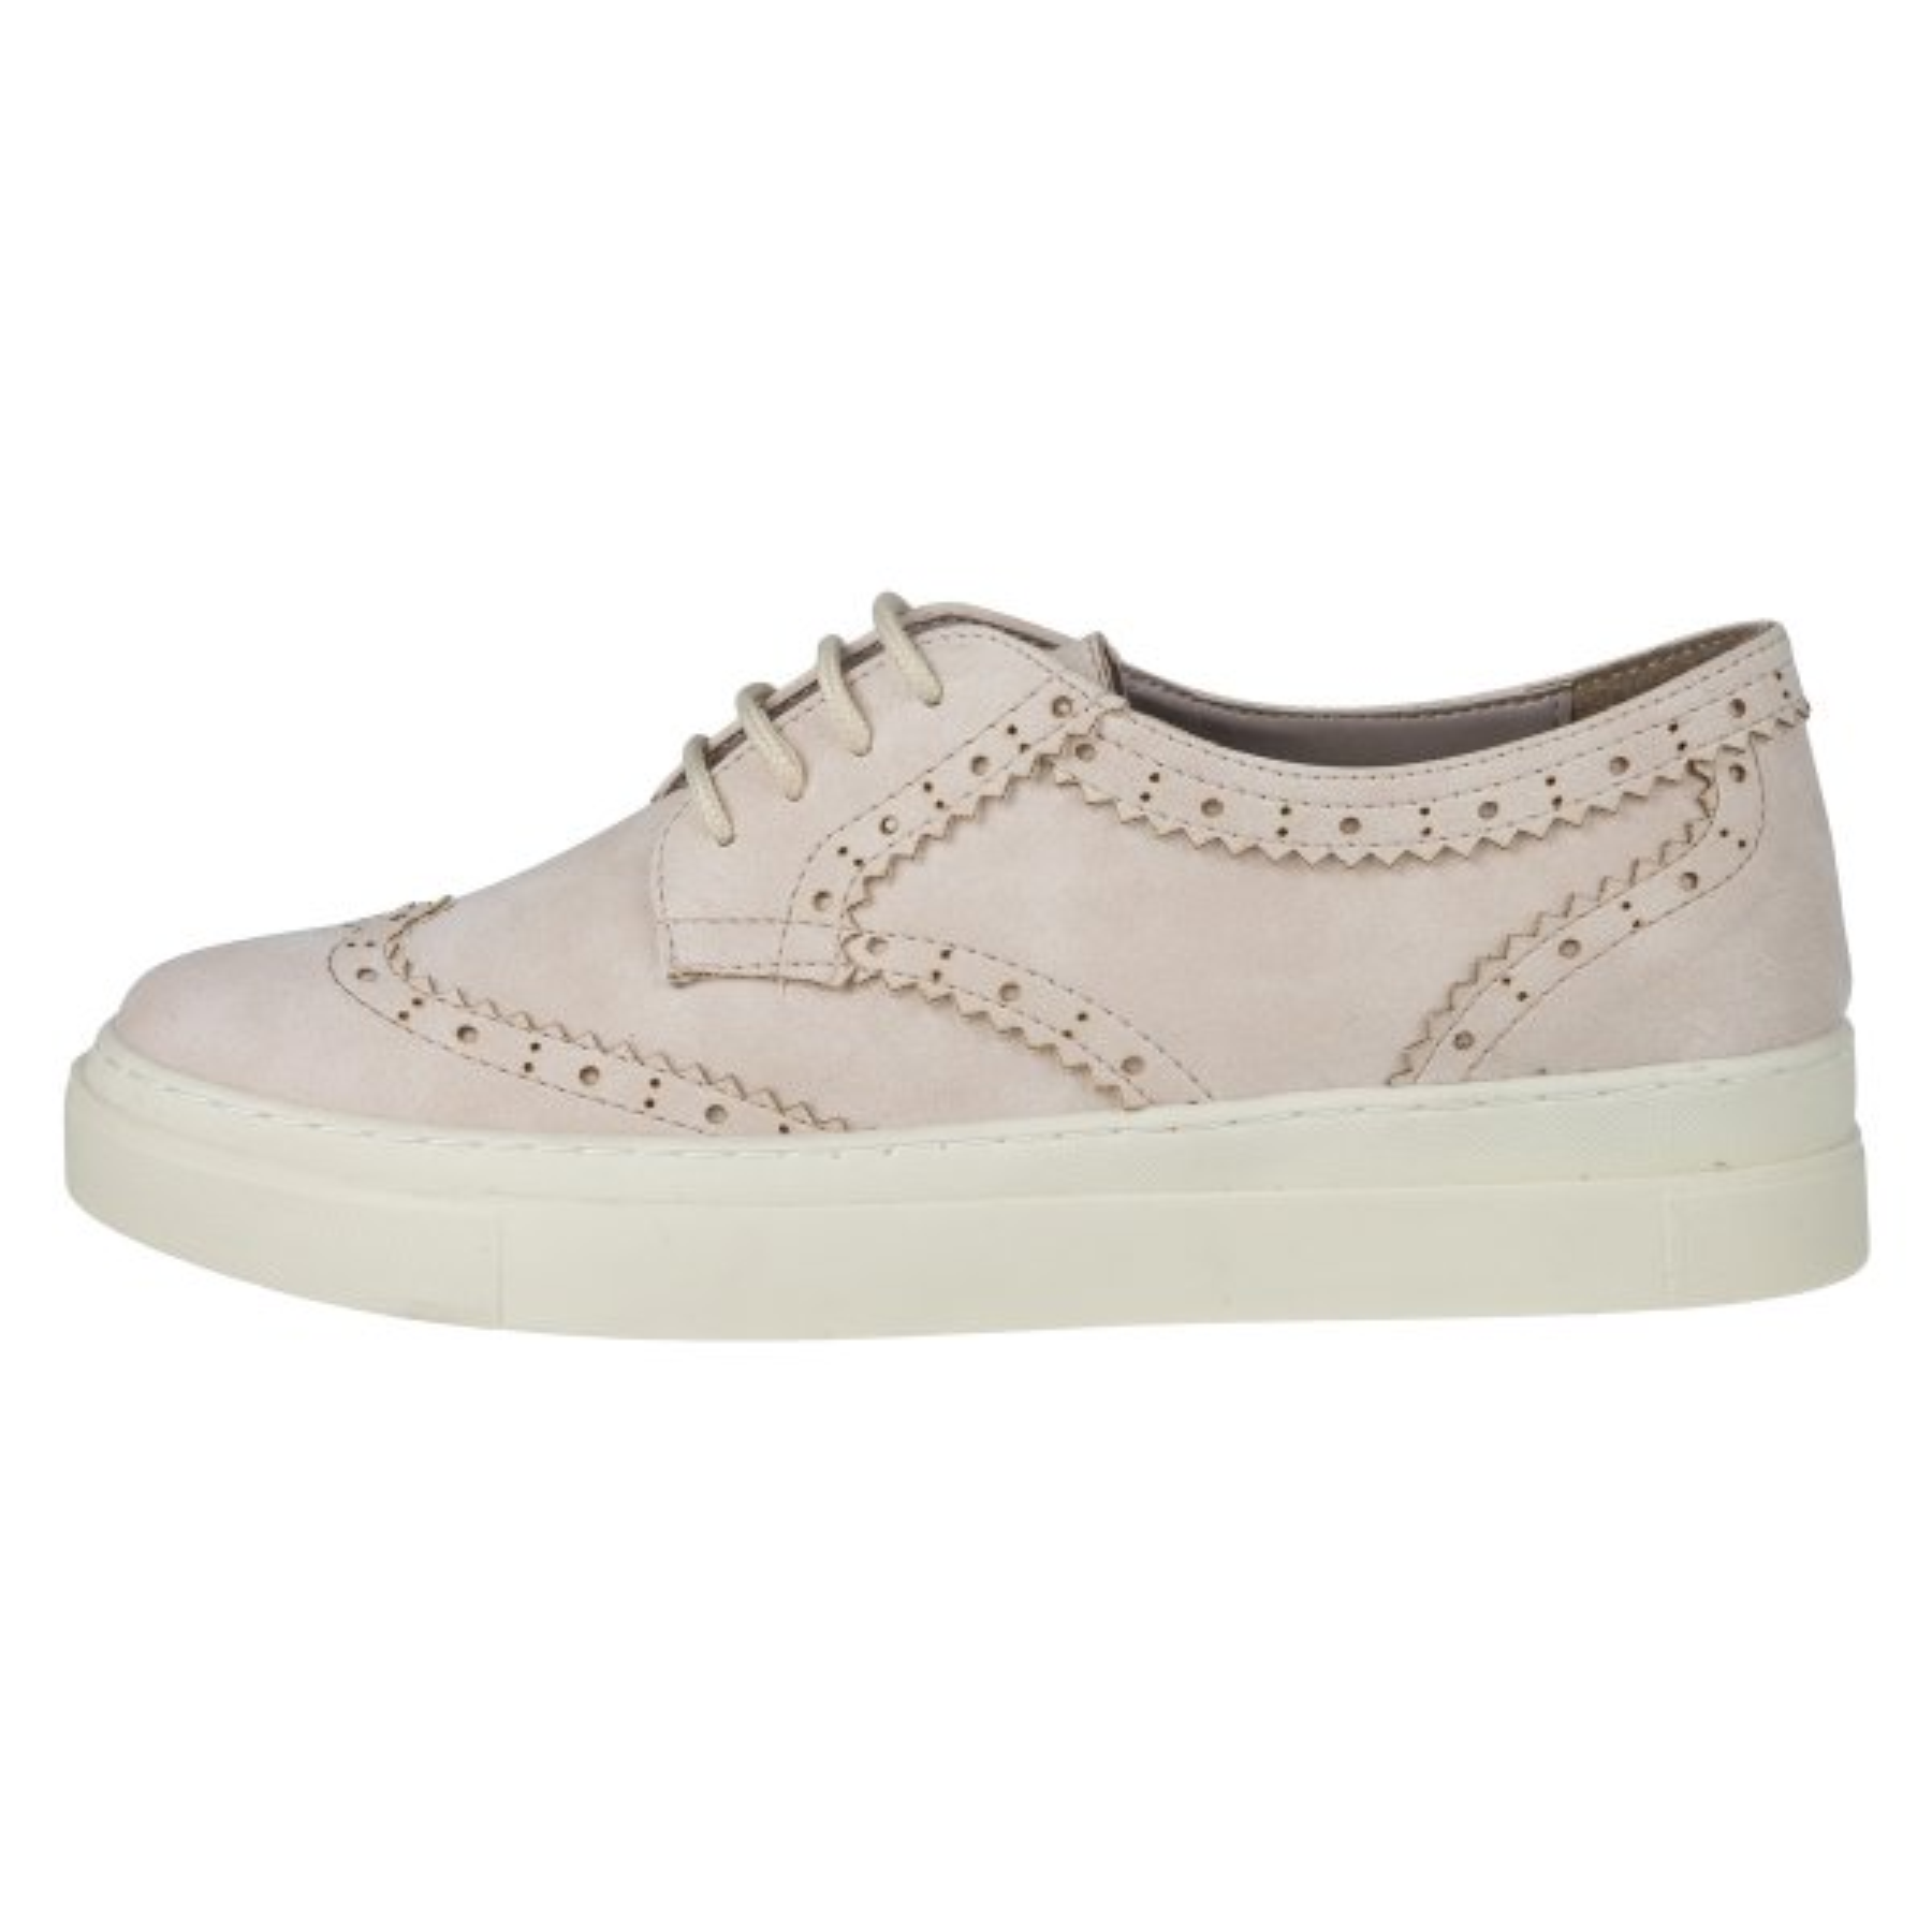 کفش روزمره زنانه بوتیگو مدل 100310451-118